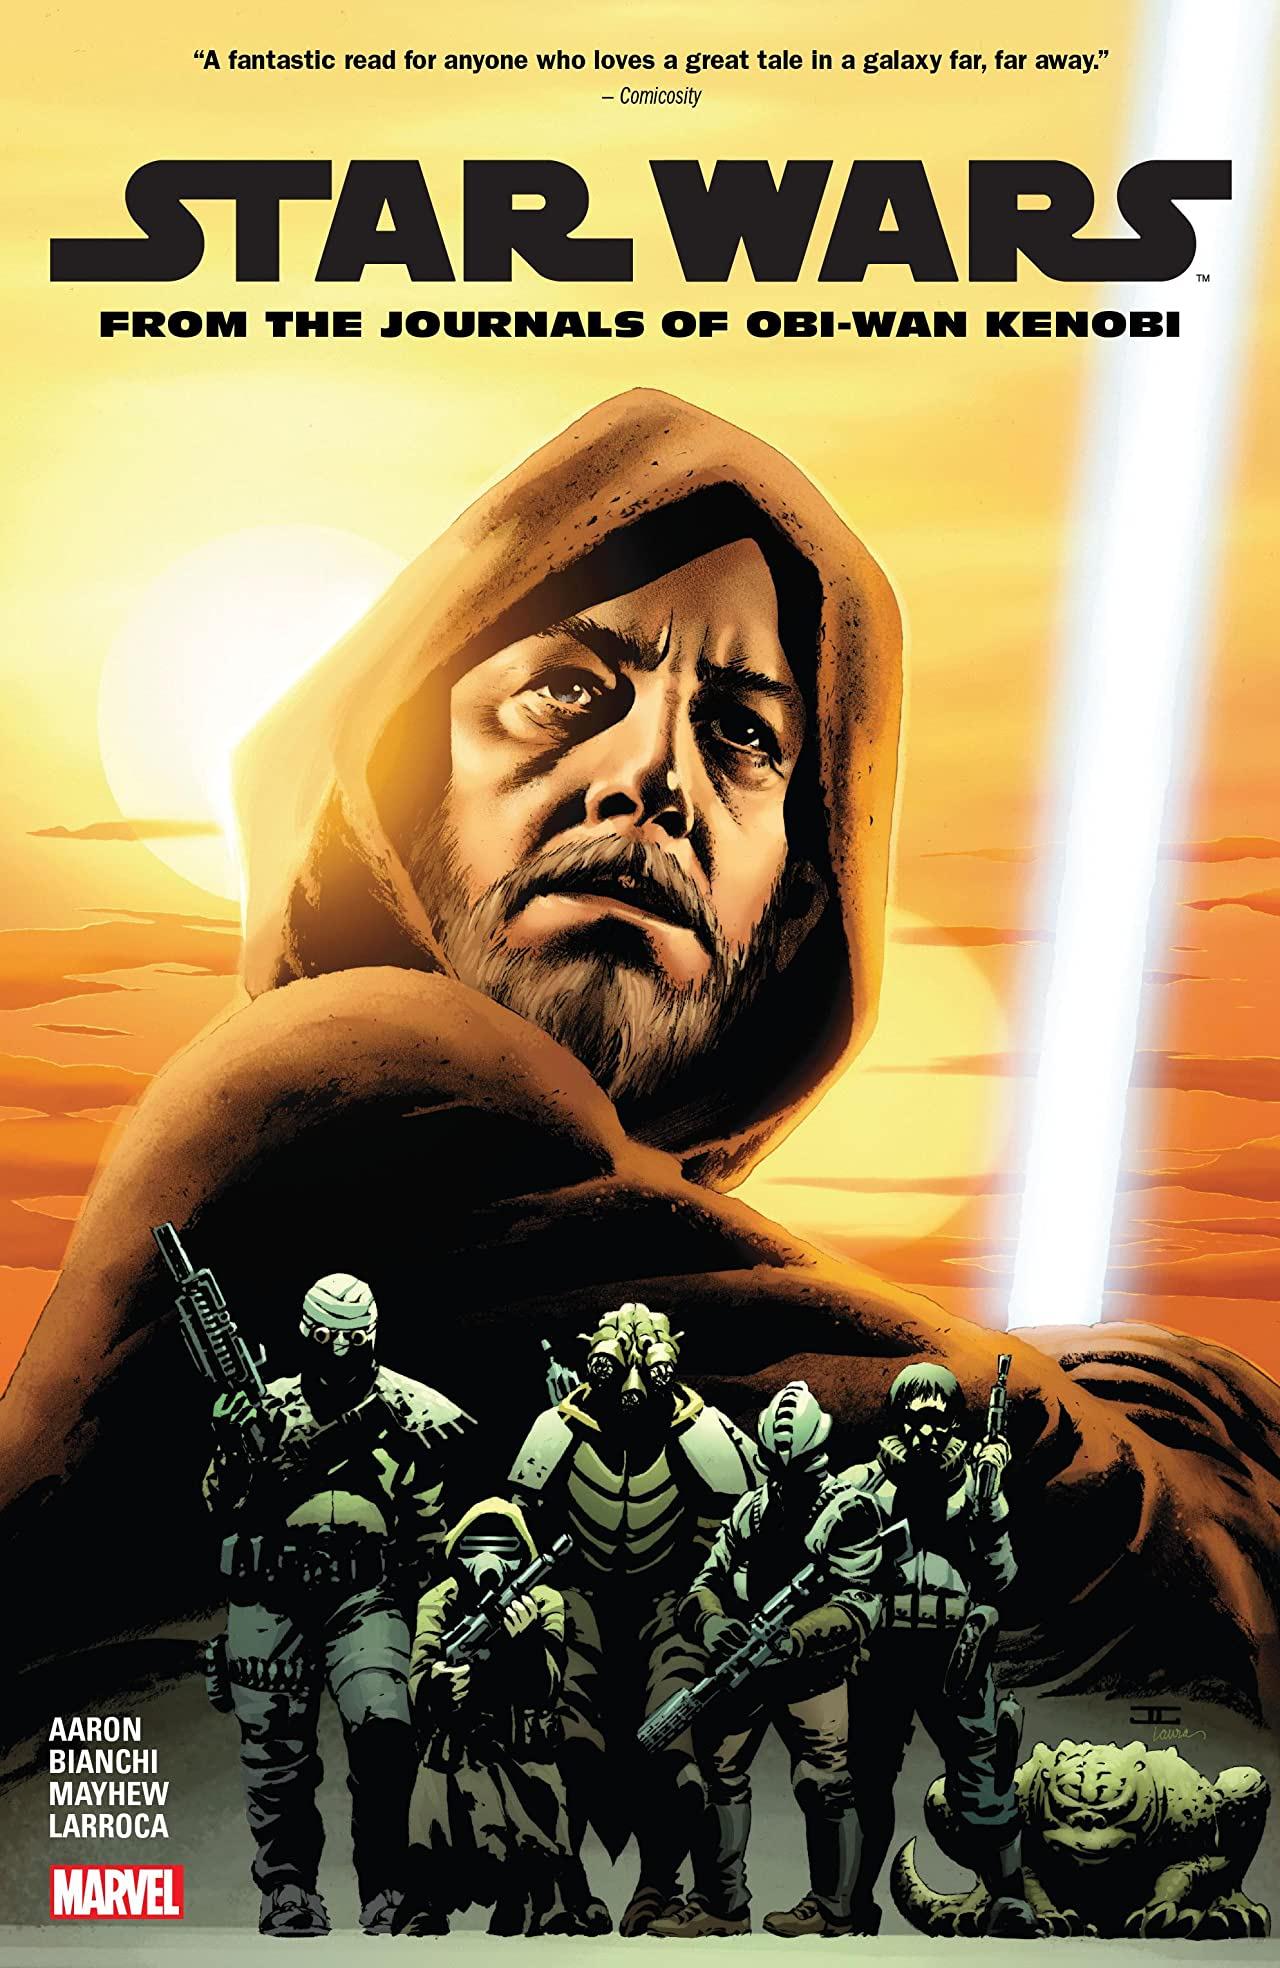 Star Wars: From The Journals Of Obi-Wan Kenobi (Trade Paperback)